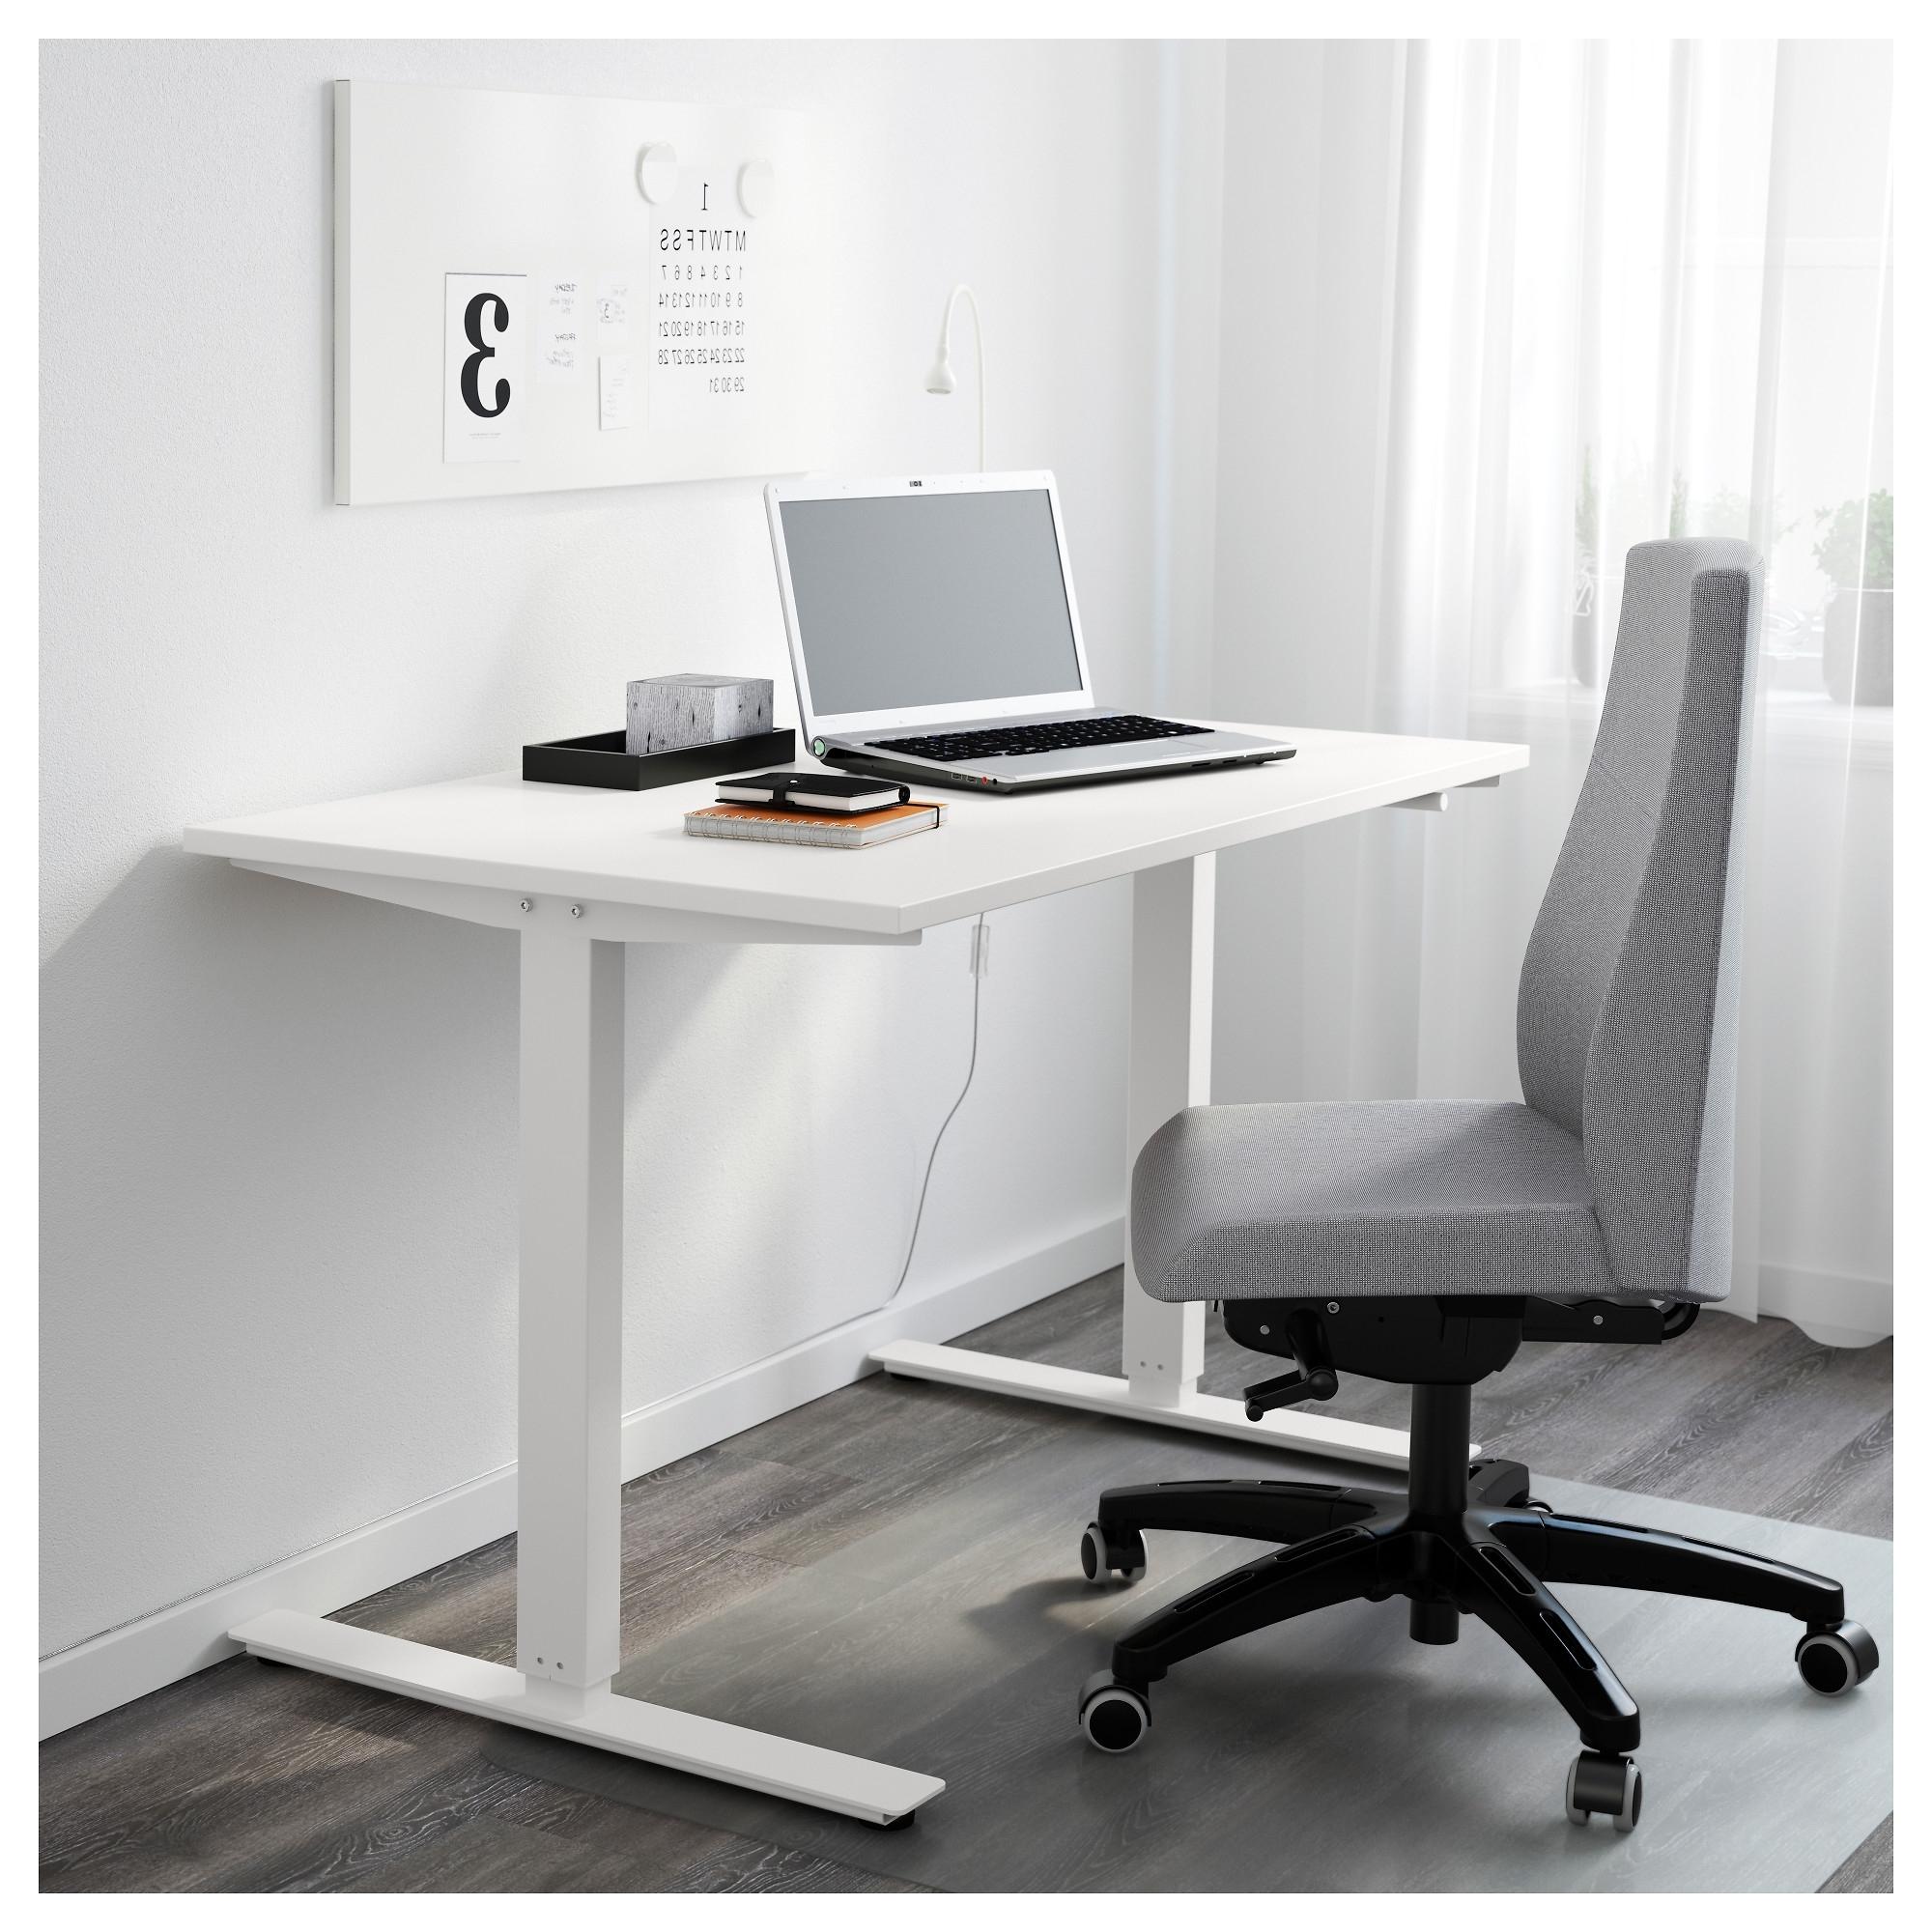 Ikea Mn Computer Desks In Fashionable Skarsta Desk Sit/stand – Ikea (View 18 of 20)